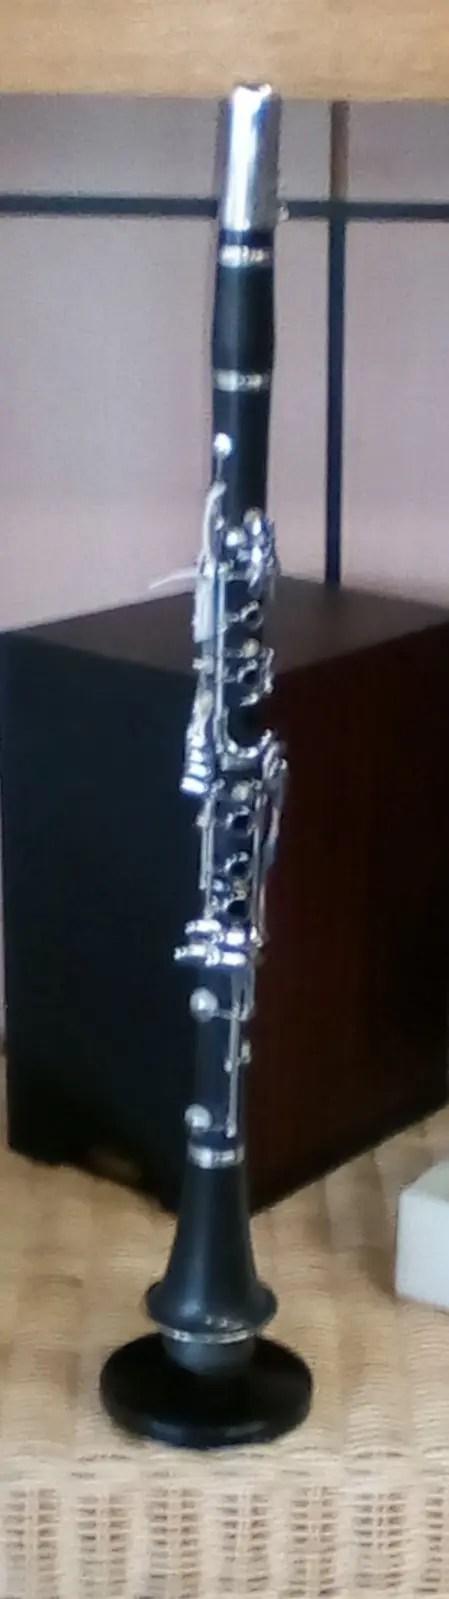 Buffet Clarinet Used